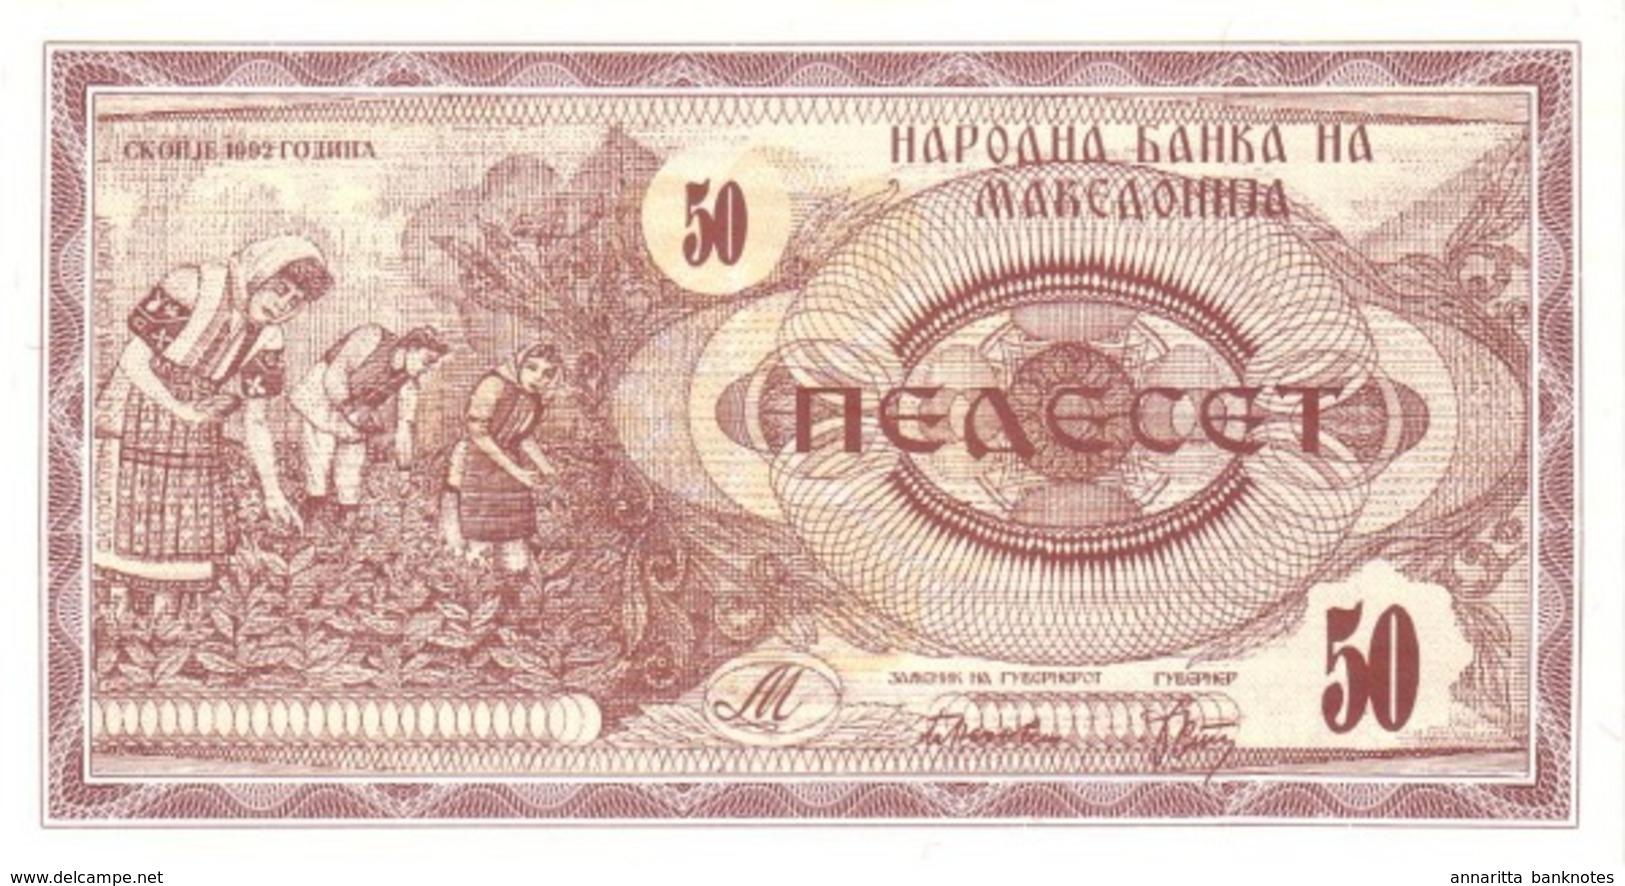 MACEDONIA 50 ДЕНАРИ (DENARI) 1992 P-3a UNC [MK103a] - Macedonia